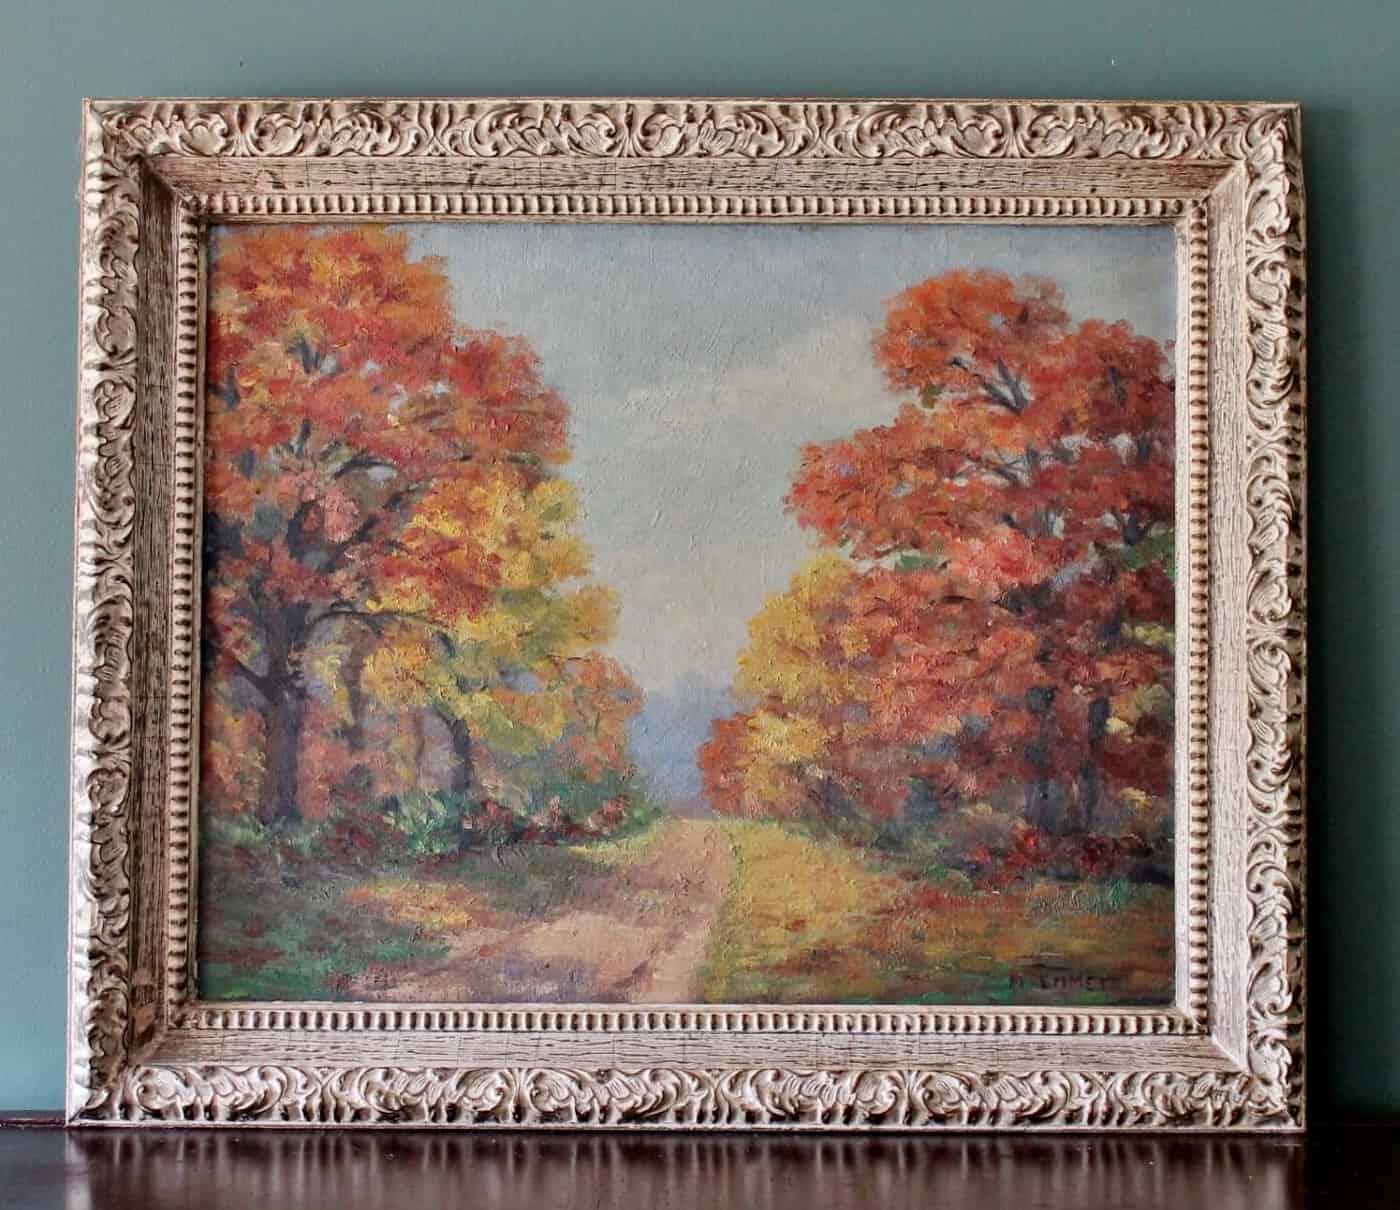 Vintage Impressionistic Style Landscape Painting